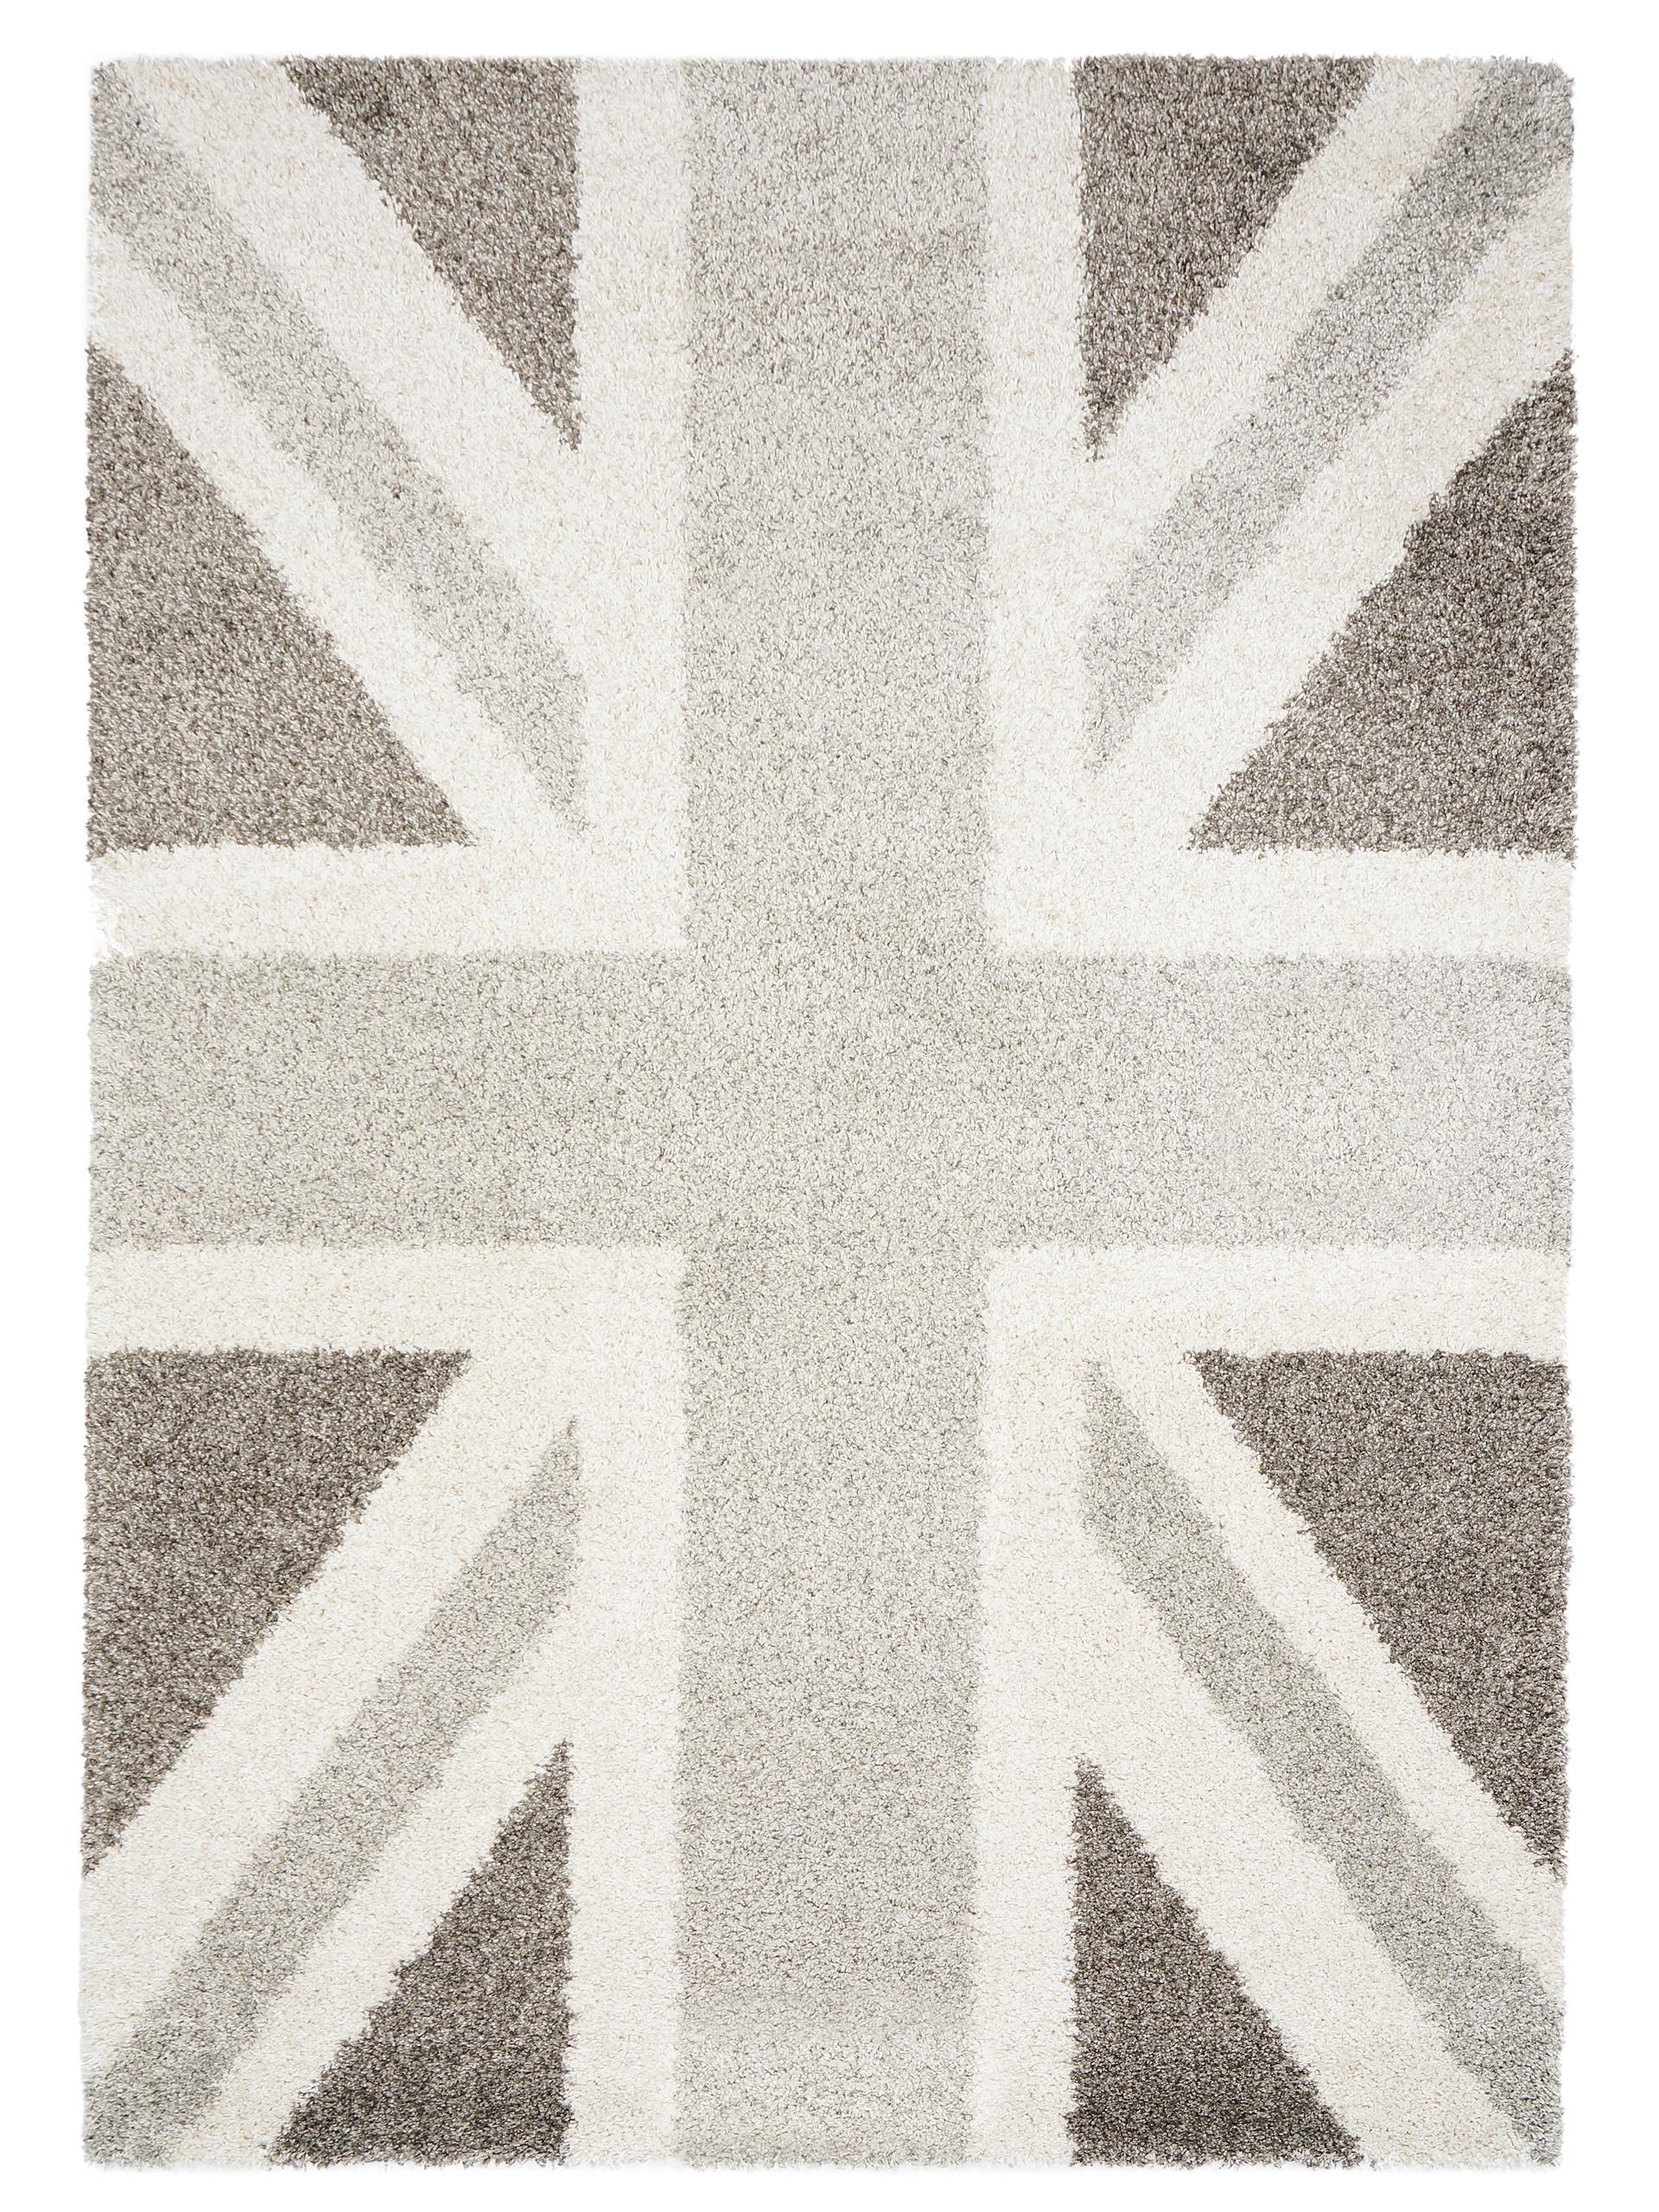 benuta hochflor shaggy teppich graphic union jack multicolor neu ovp ab 94 95 ebay. Black Bedroom Furniture Sets. Home Design Ideas